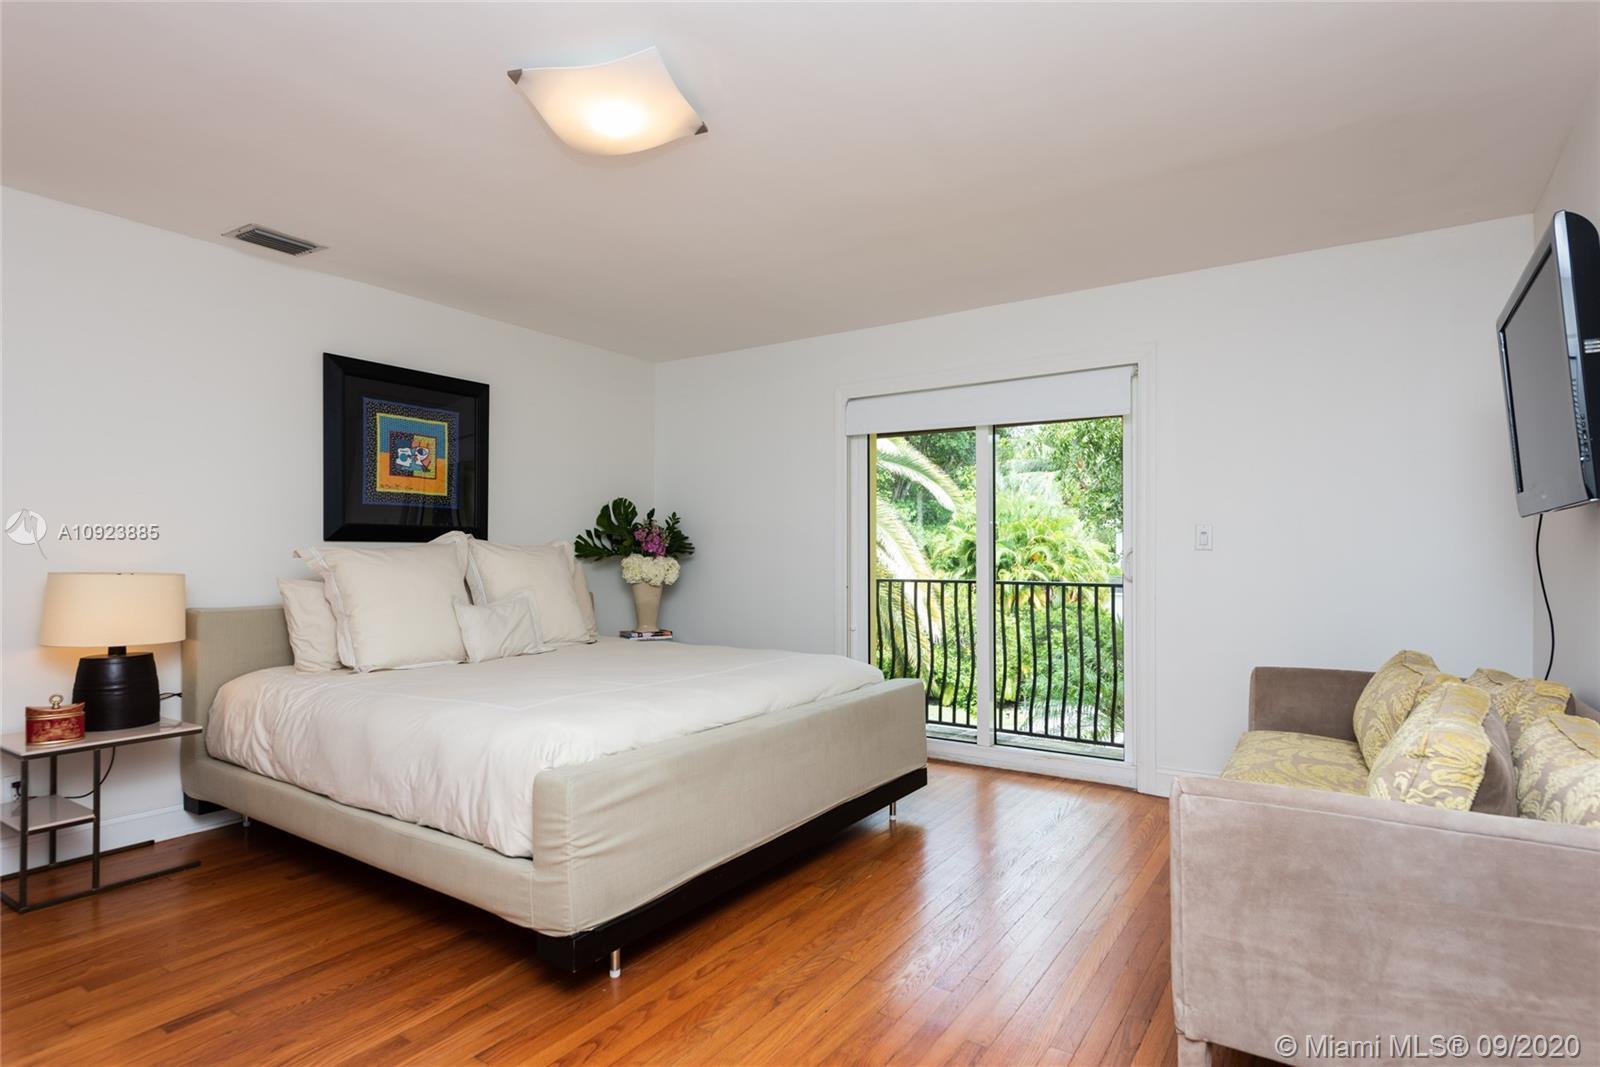 Guest Bedroom 2 with balcony and en-suite bathroom